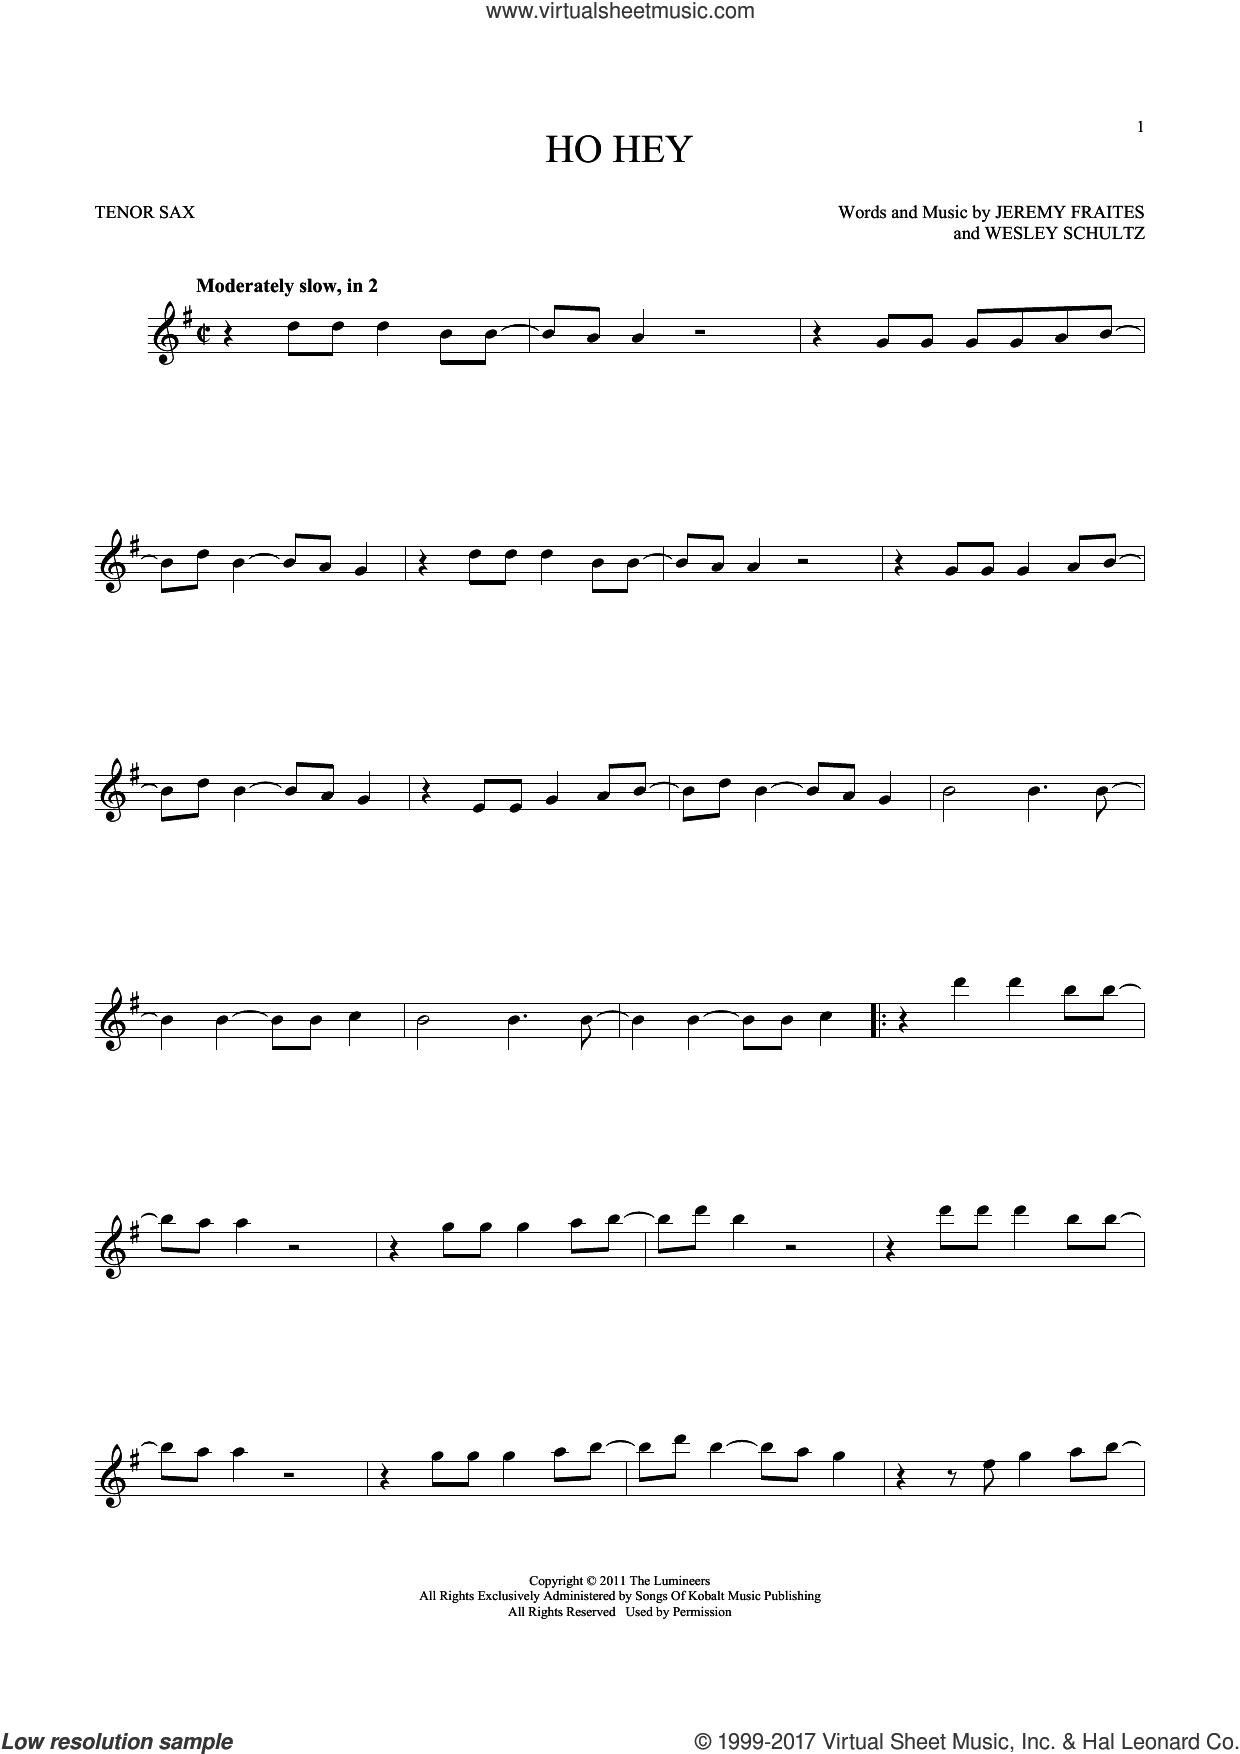 Ho Hey sheet music for tenor saxophone solo by The Lumineers, Lennon & Maisy, Jeremy Fraites and Wesley Schultz, intermediate skill level